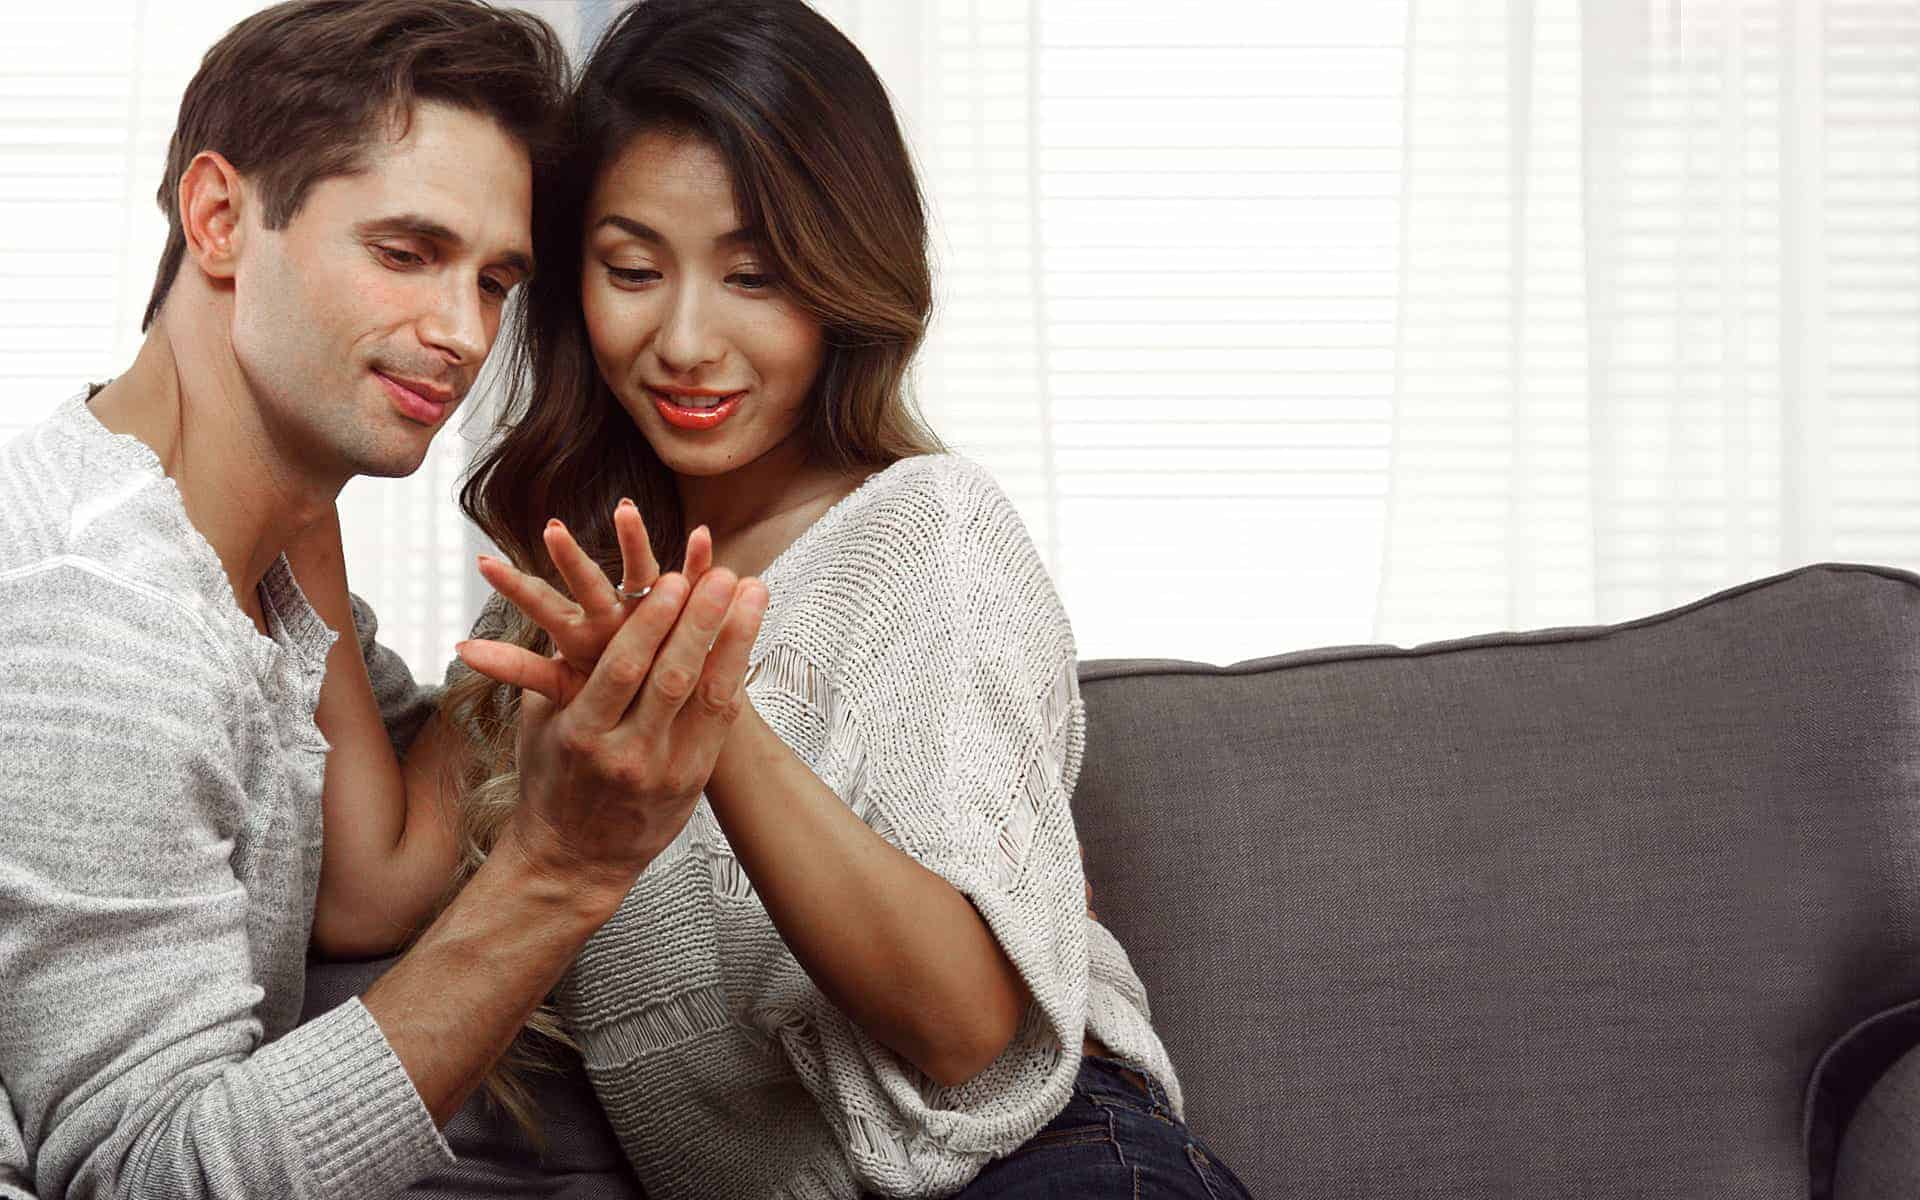 Premarital Screening and Verification in New York